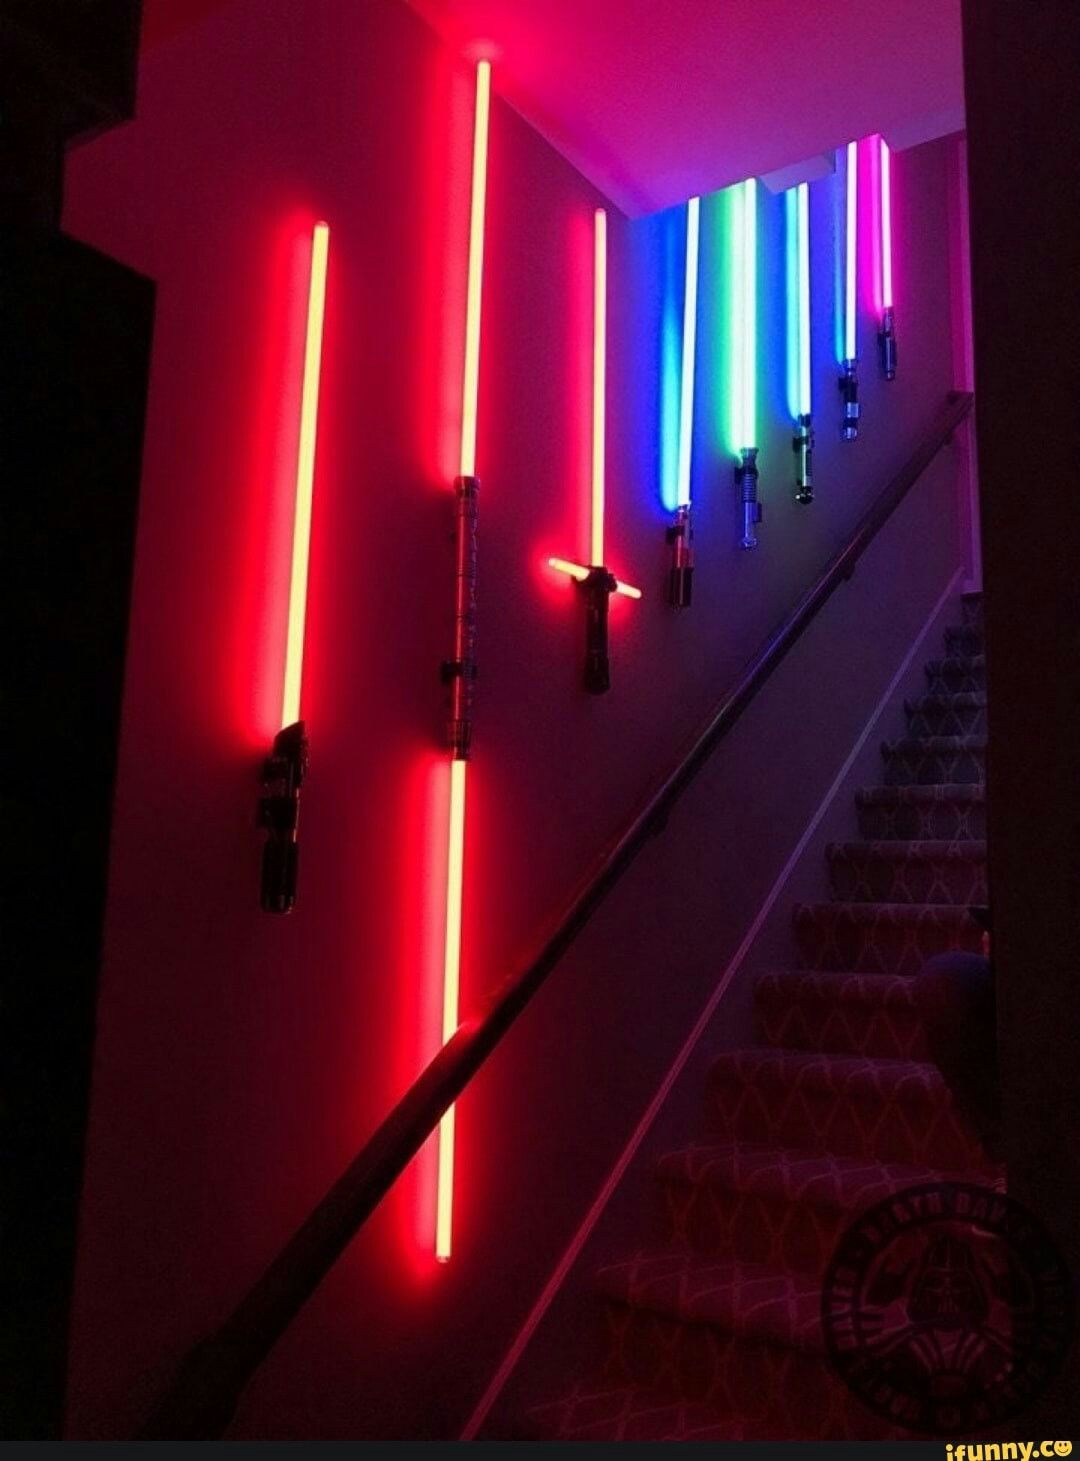 Light Saber Wall Decor In 2020 Star Wars Light Saber Lightsaber Light